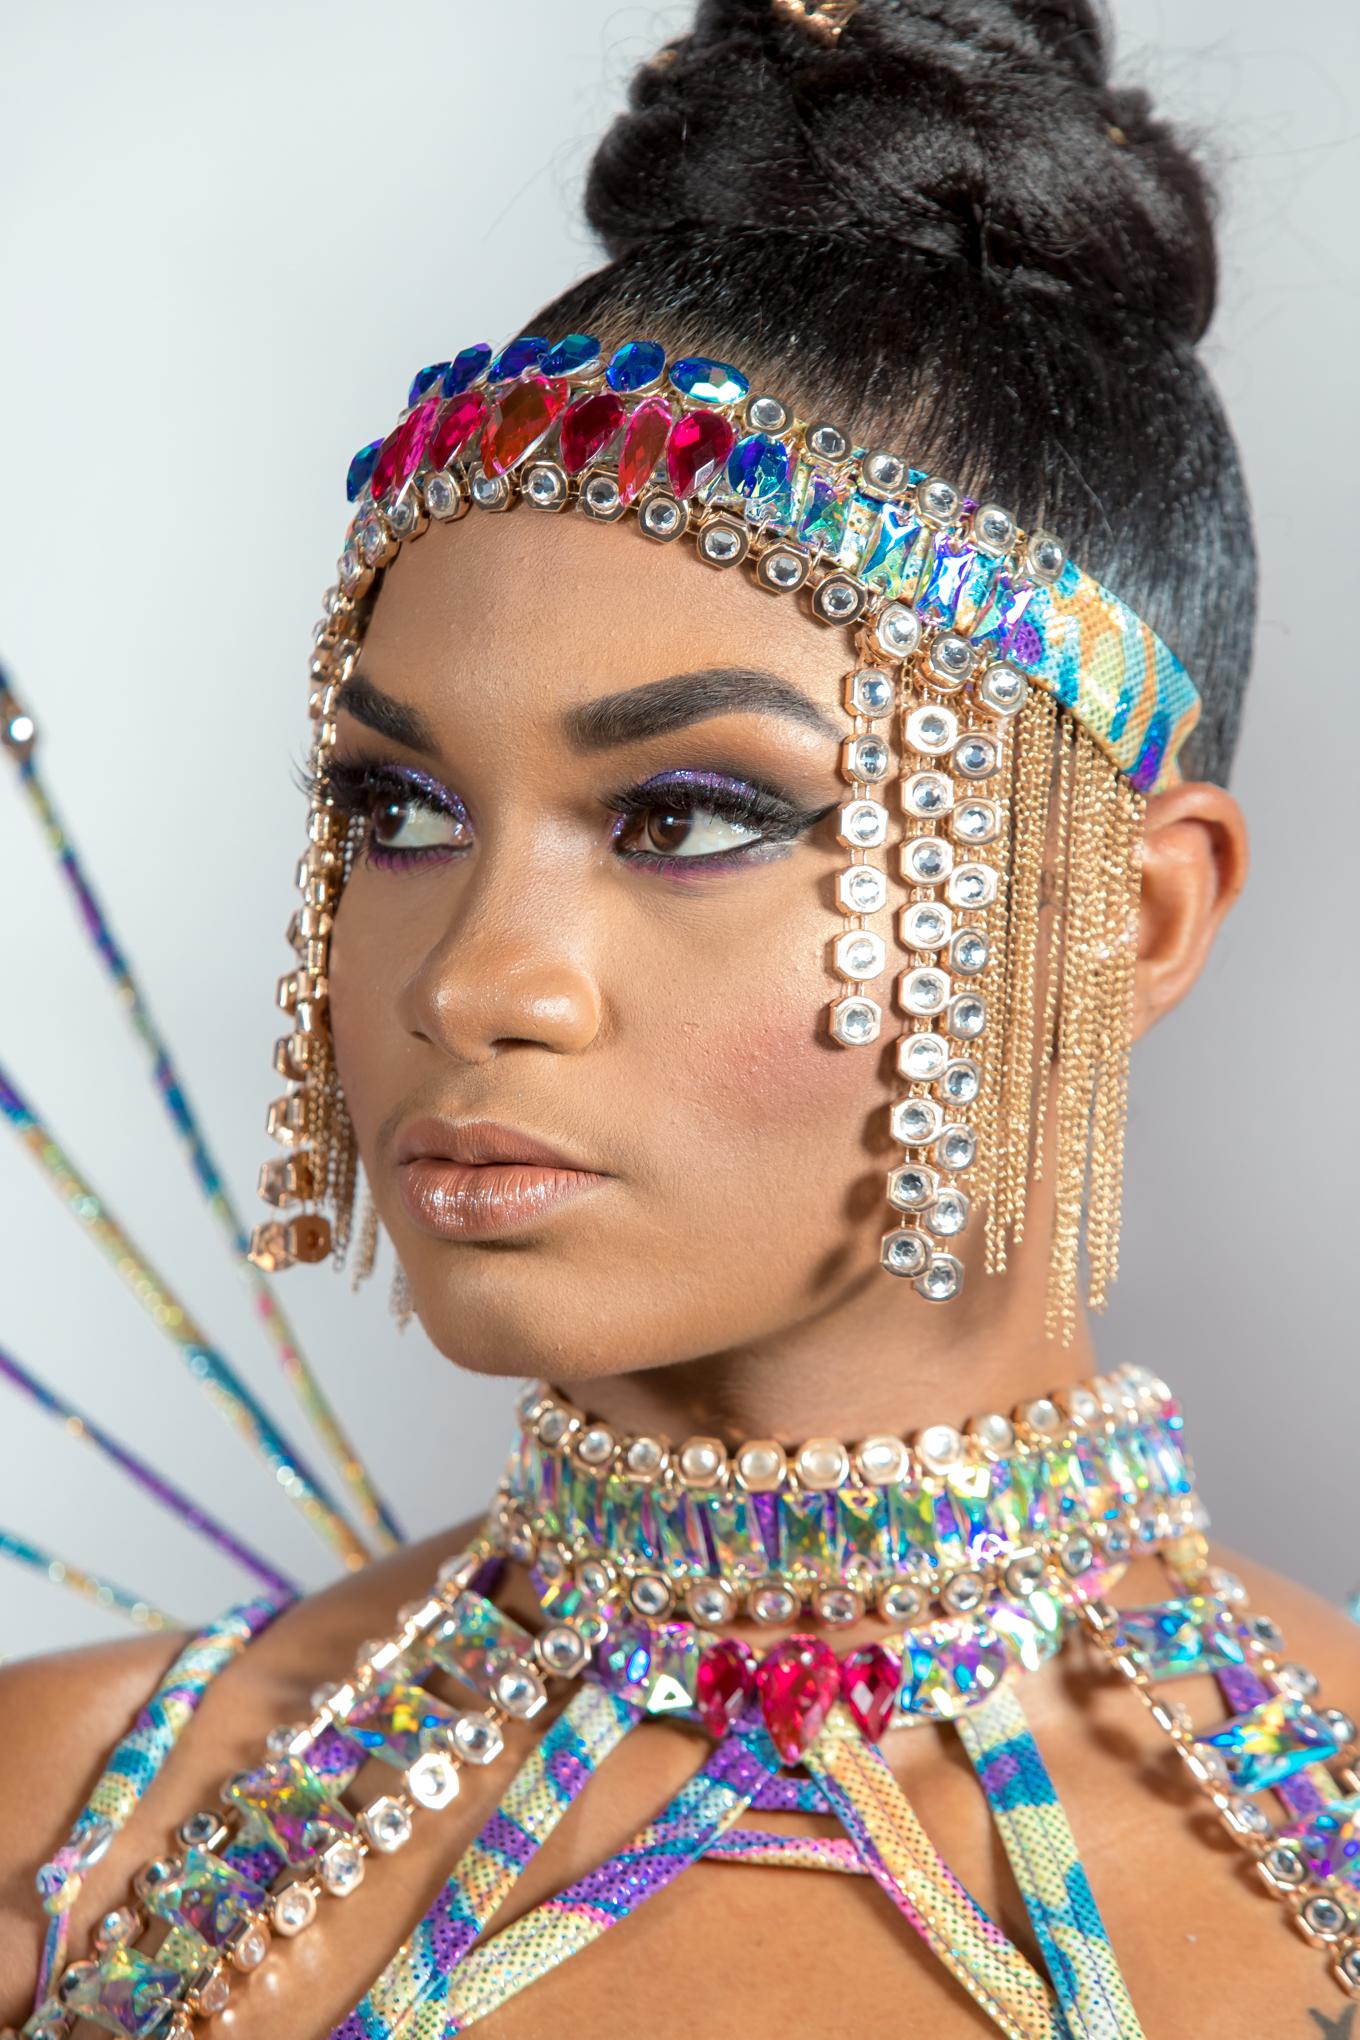 Psychedelic tiara close-up.jpg